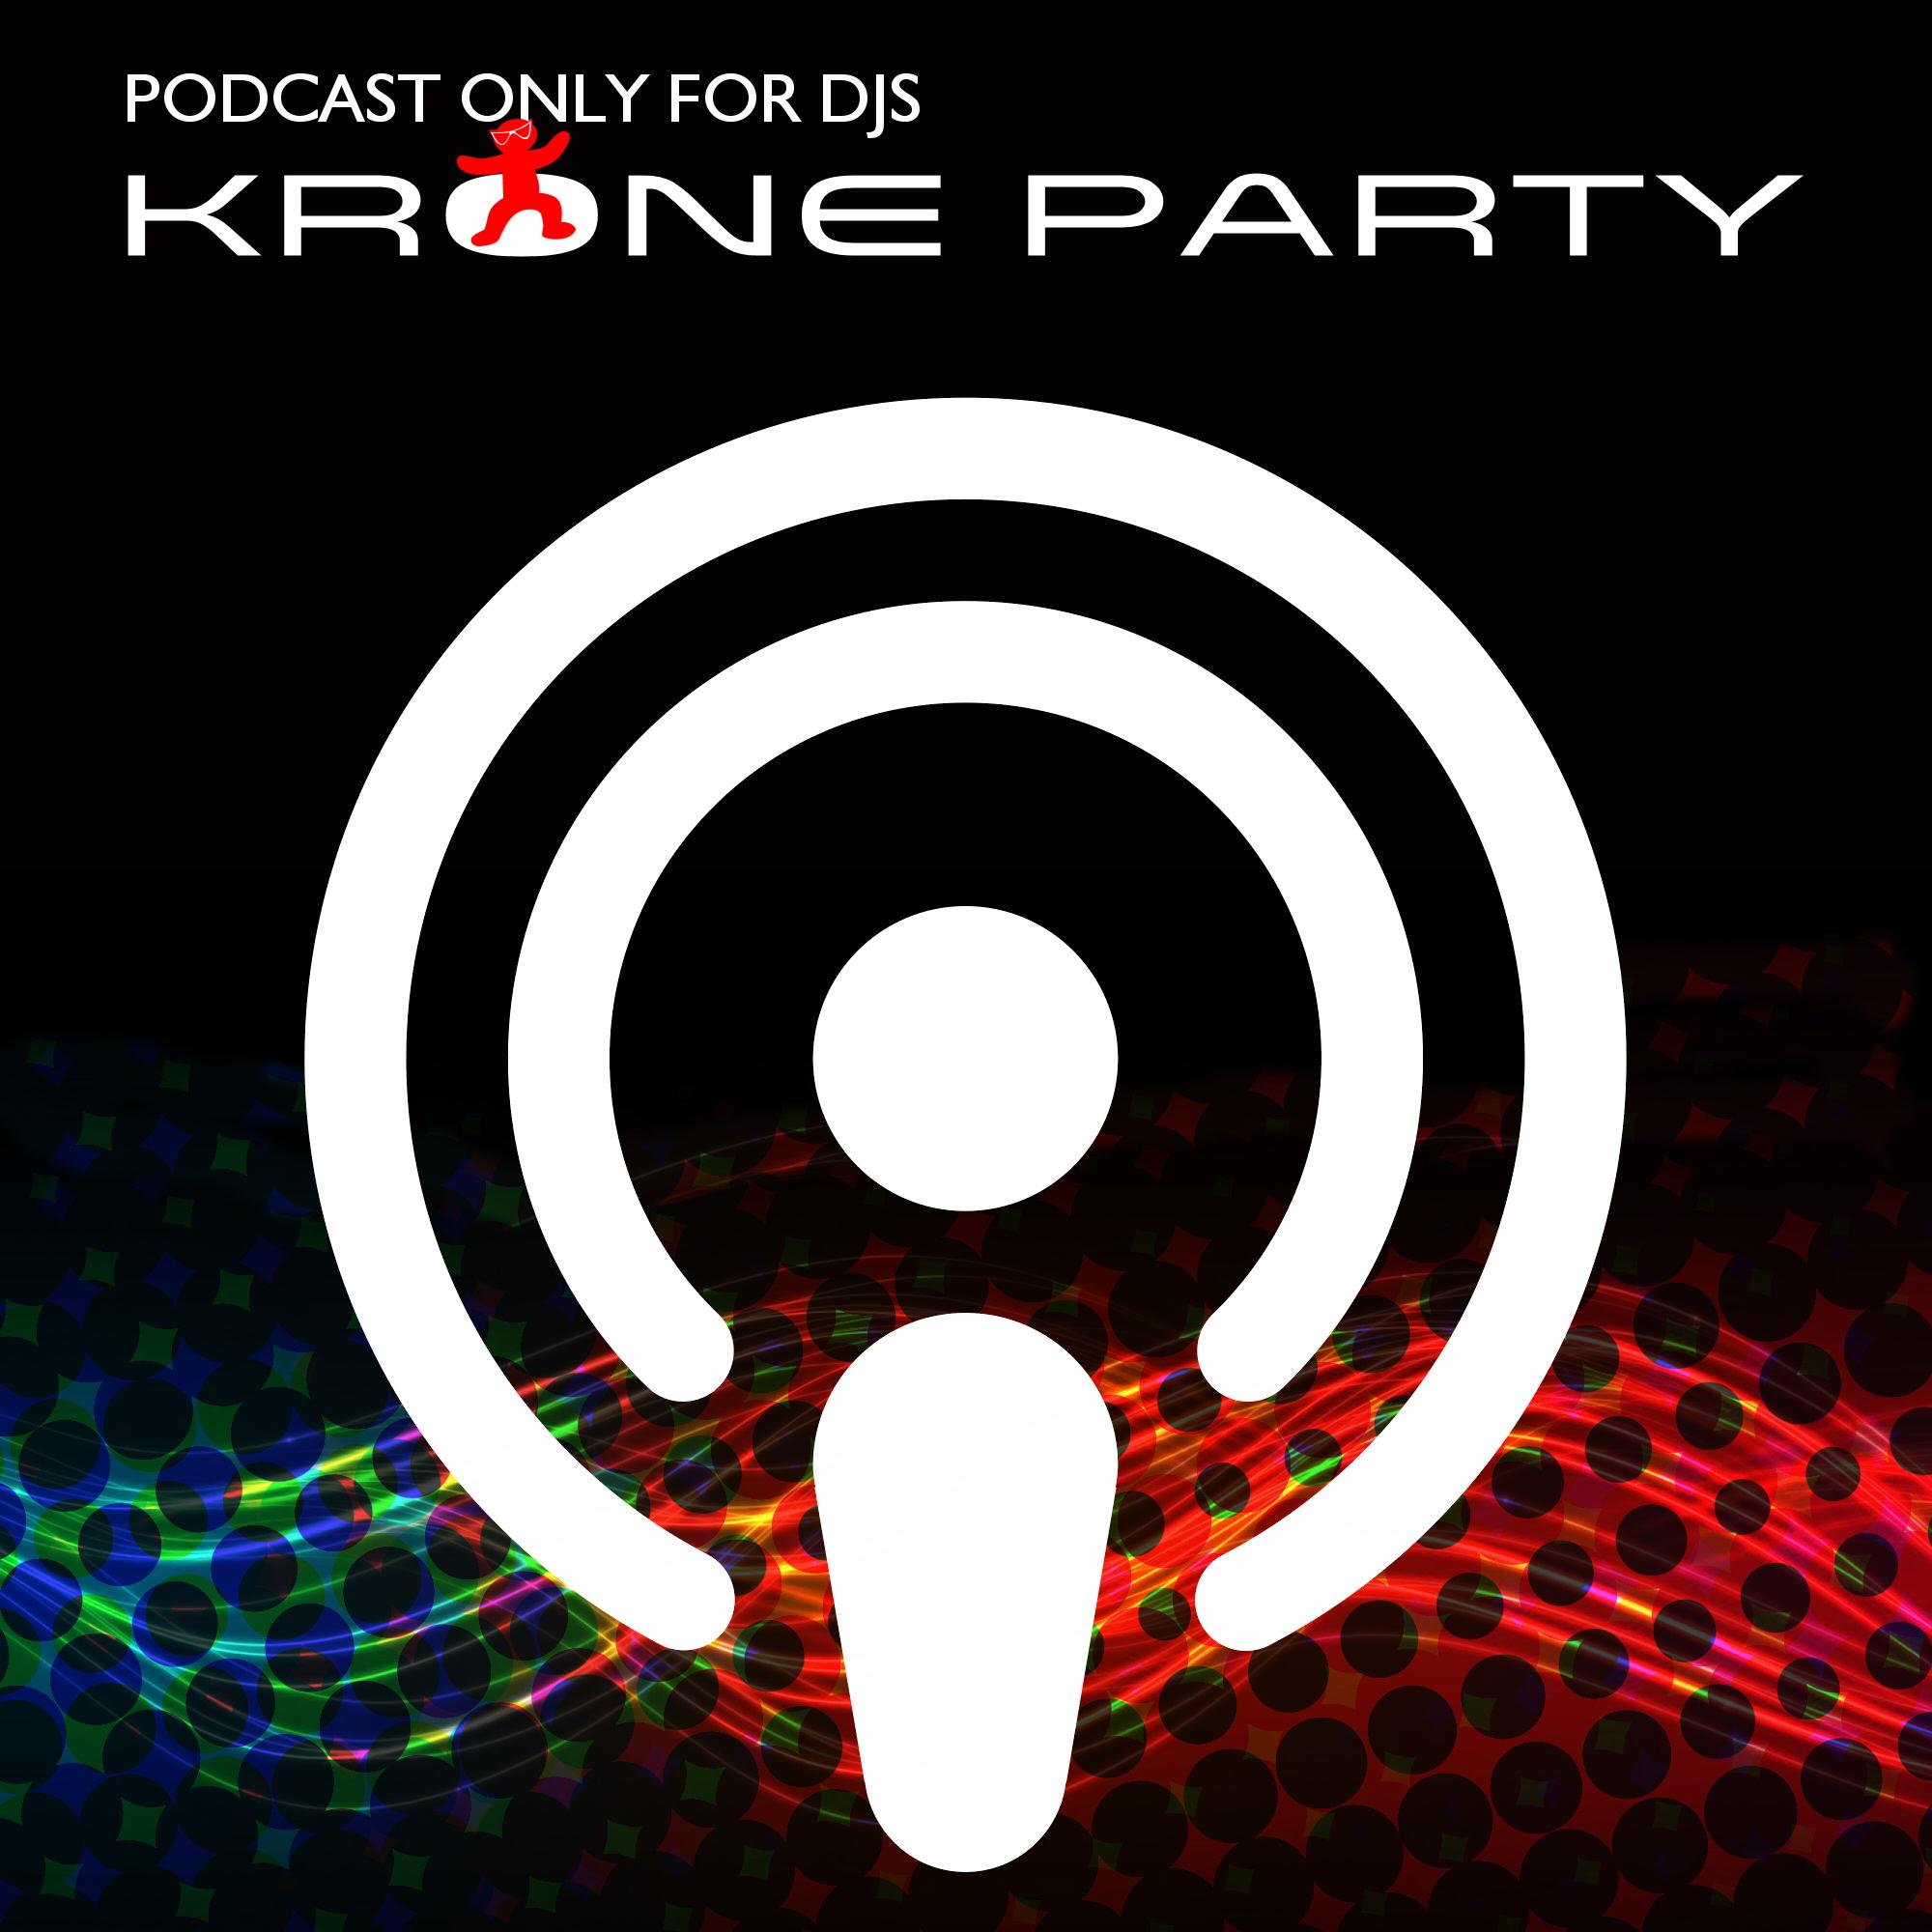 Marco Corona & Krone Party